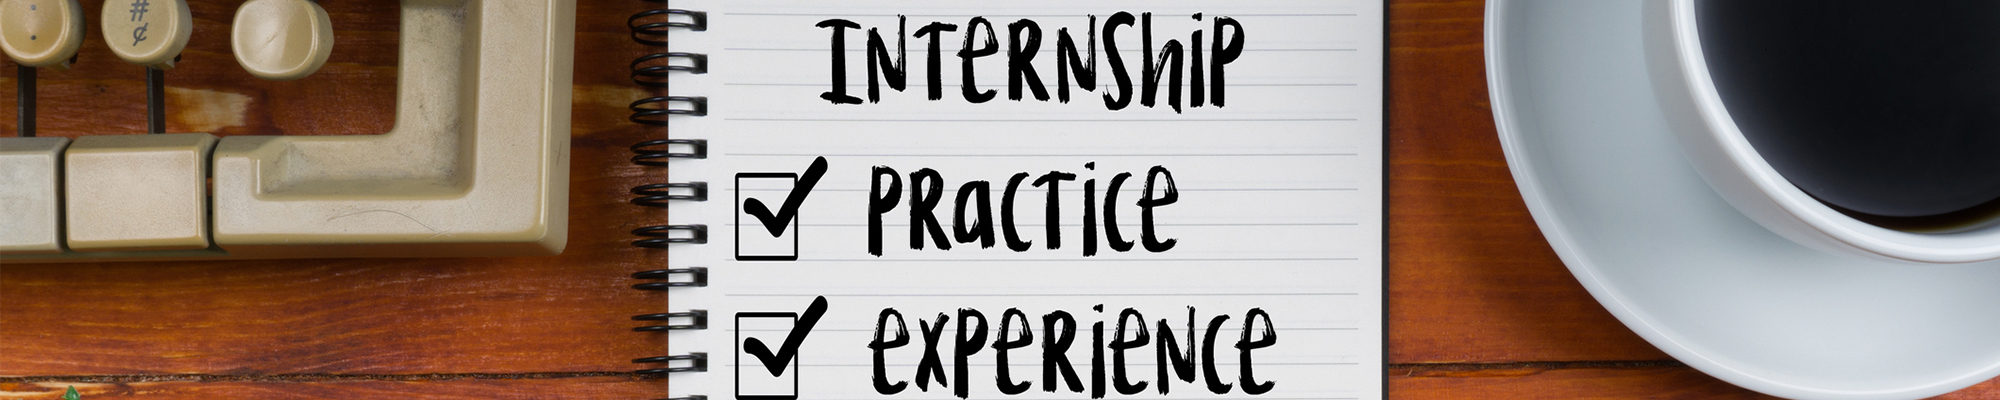 Internship, practice, experience